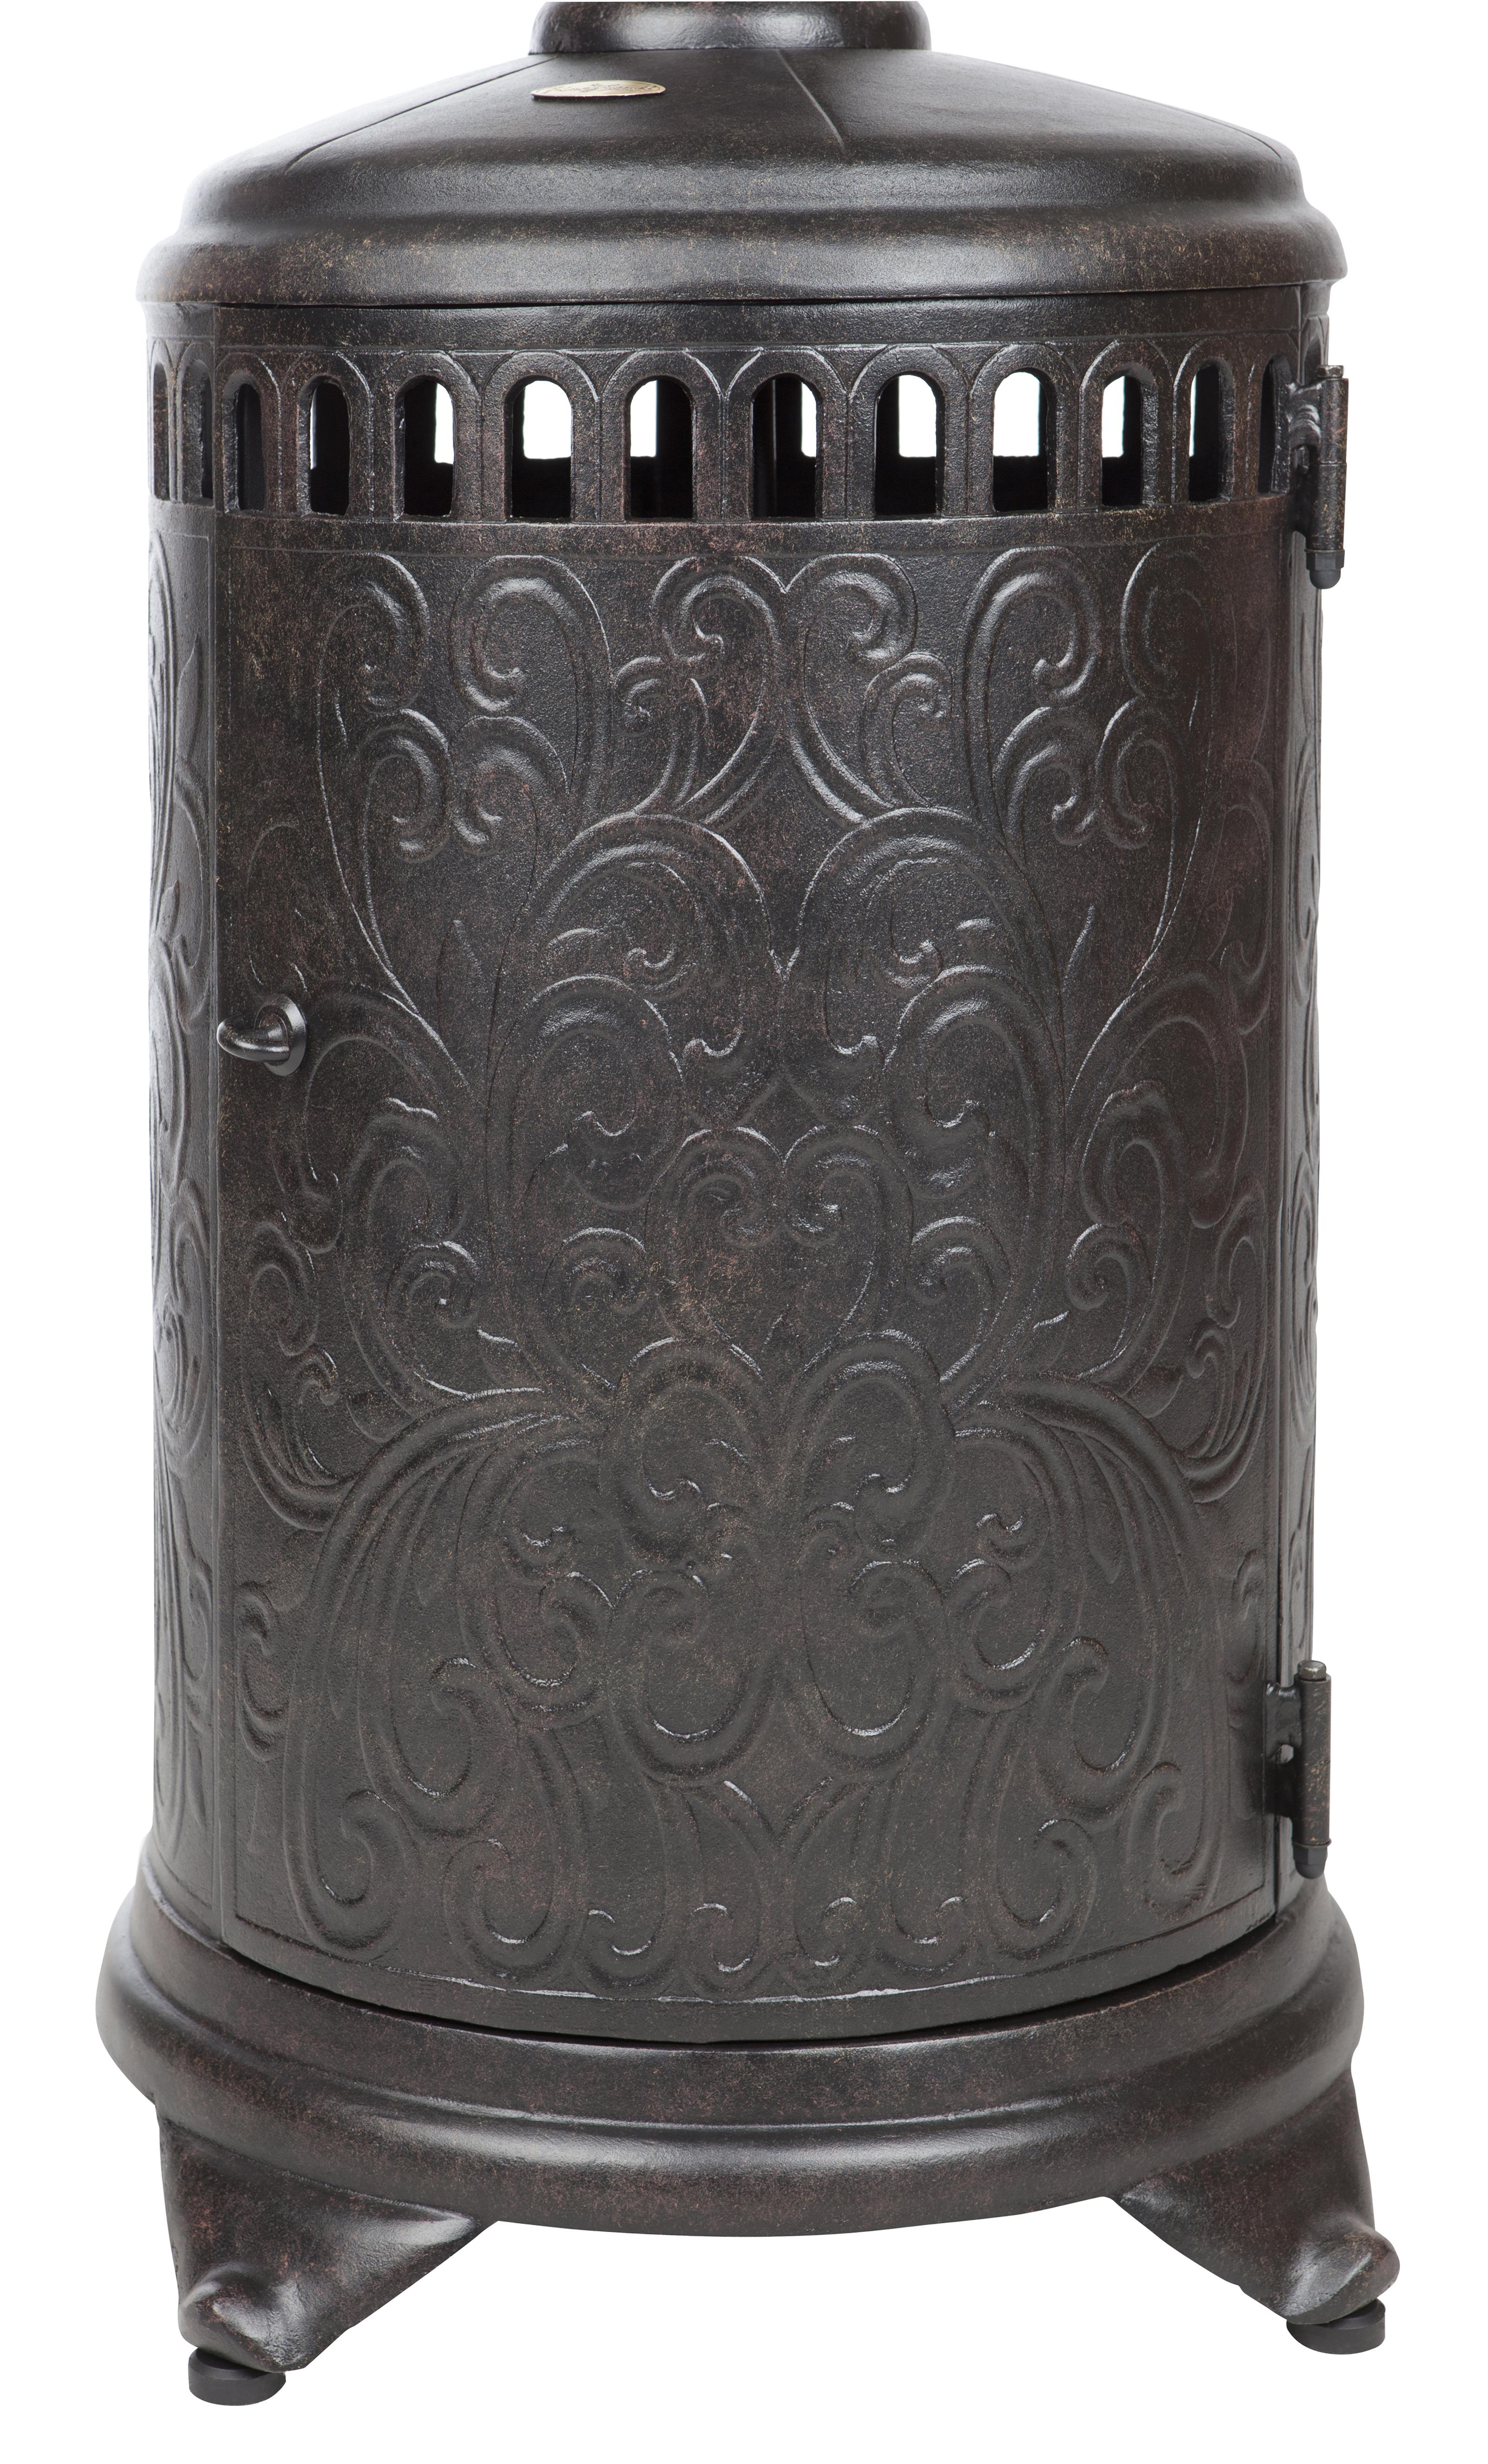 Sedona Cast Aluminum Propane Patio Heater Well Traveled